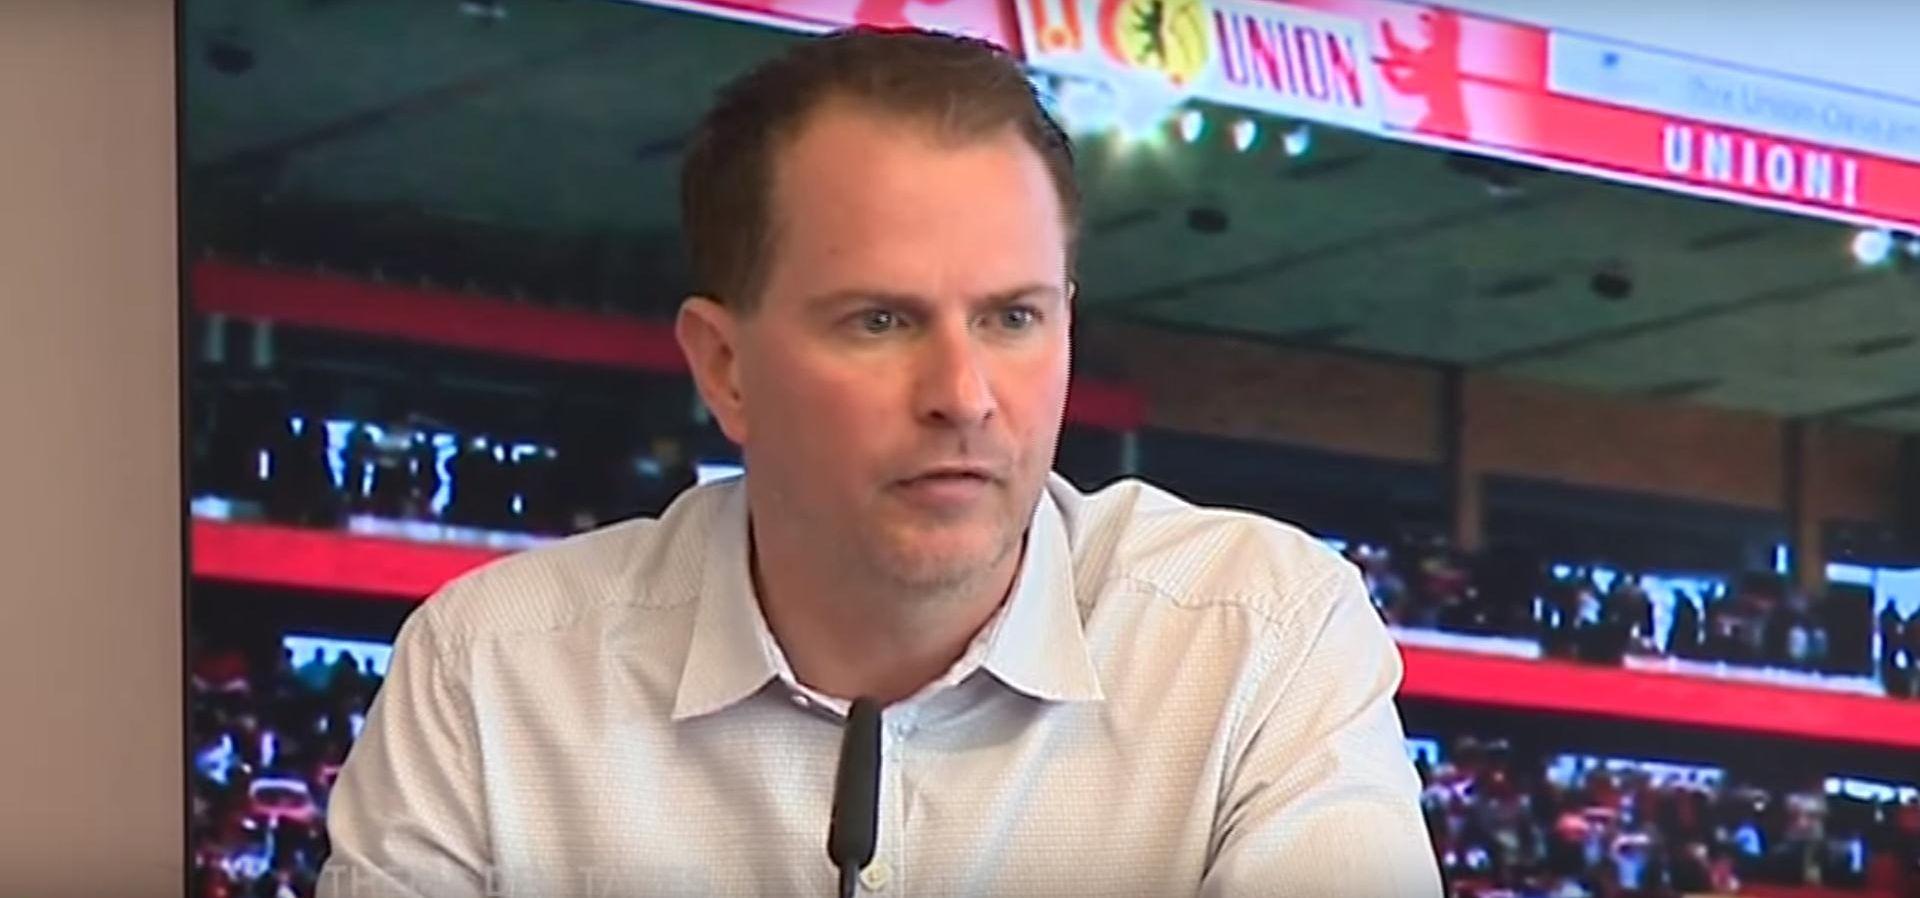 SNDROM KRONIČNOG UMORA Bivši trener Bayer Leverkusena pronađen mrtav u svom domu